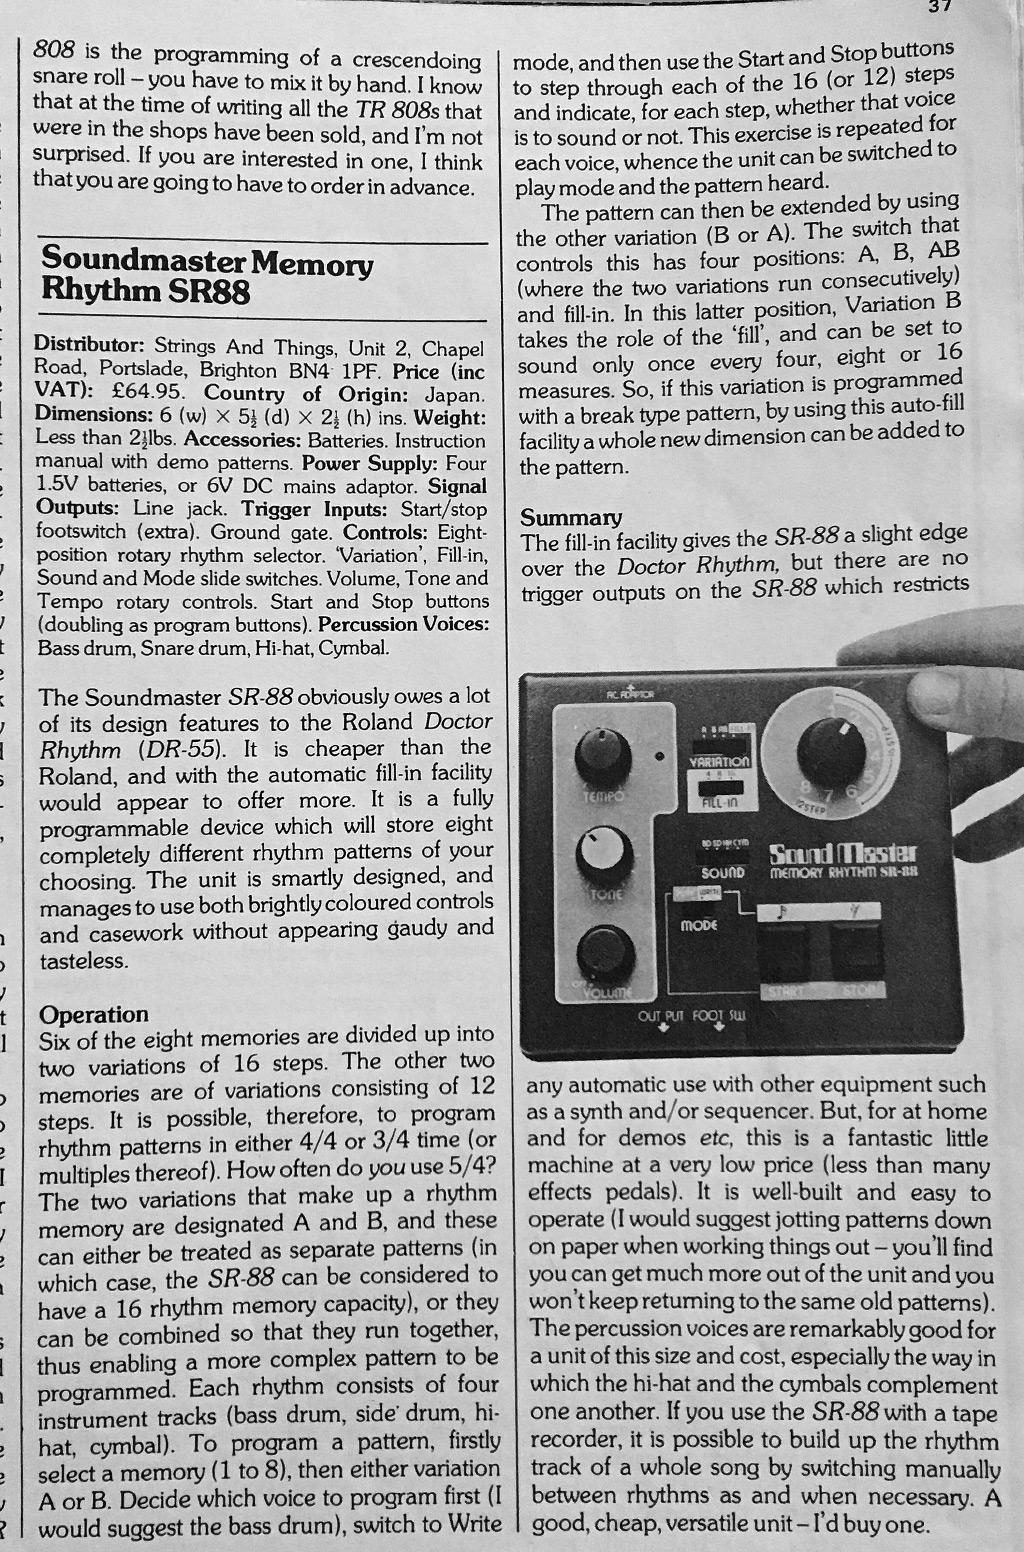 Soundmaster Memory Rhythm SR-88 review scan